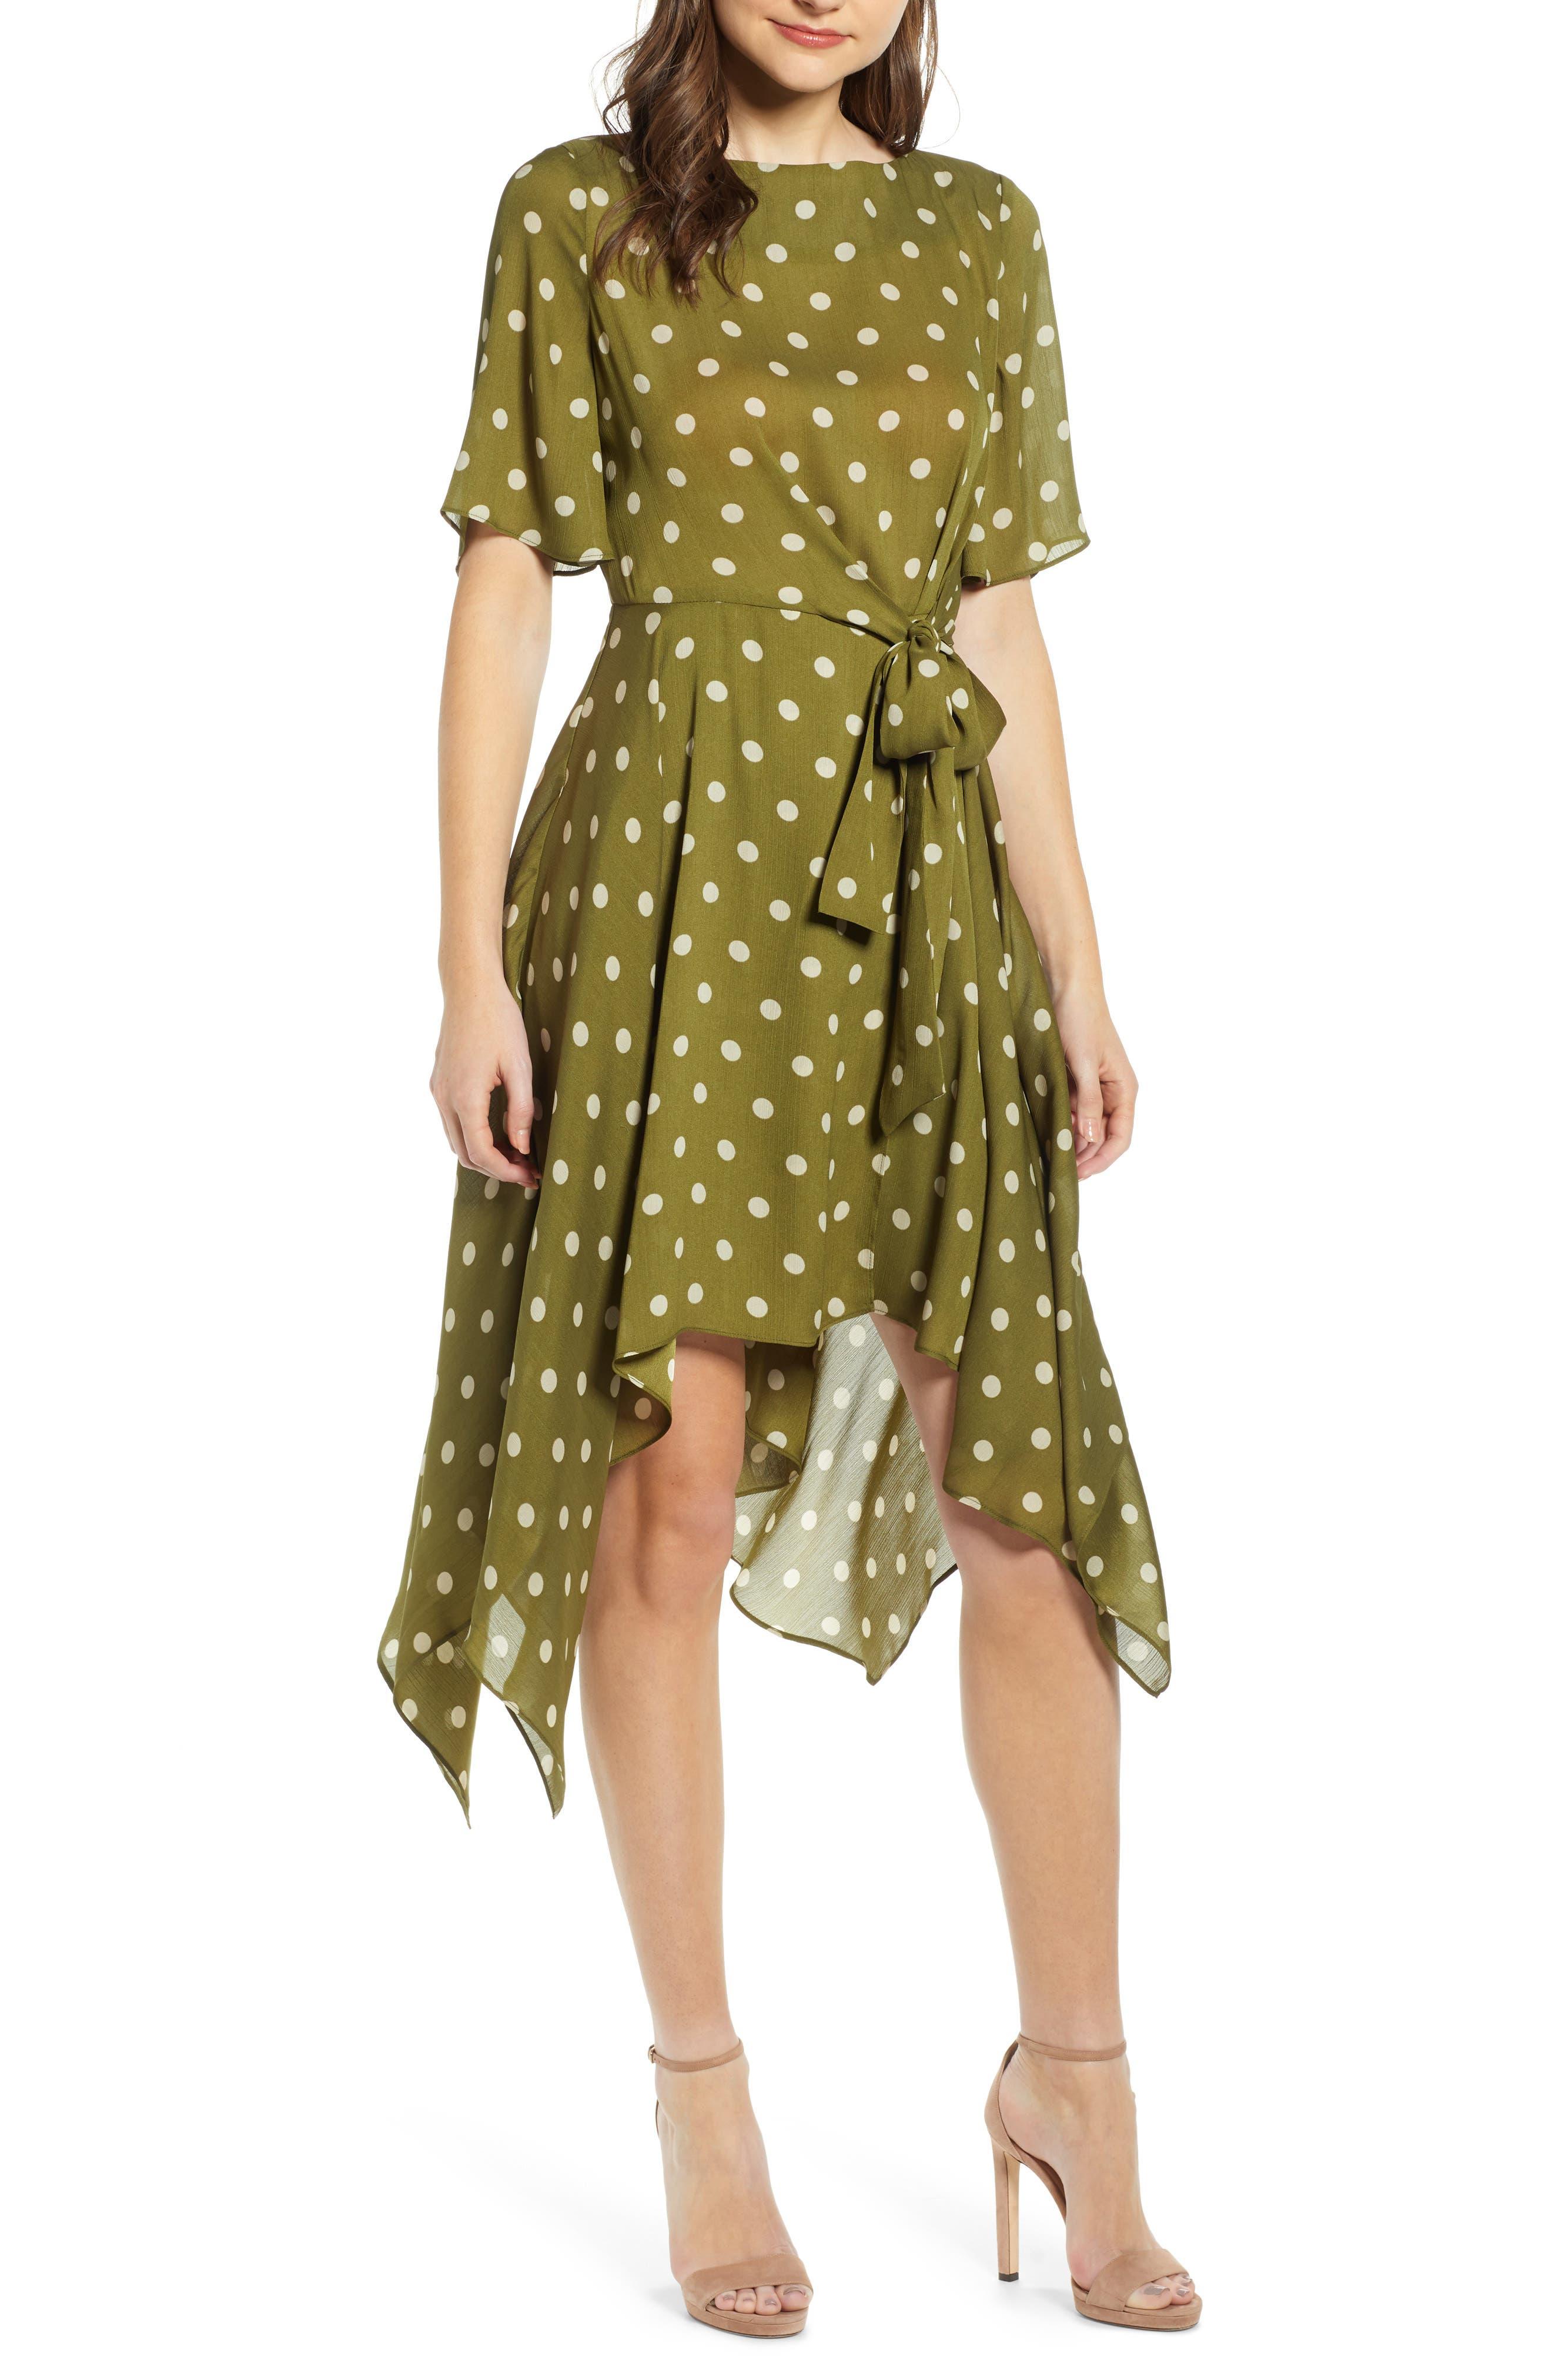 CHRISELLE LIM COLLECTION Chriselle Lim Marie Handkerchief Hem Midi Dress, Main, color, CREAM/ OLIVE